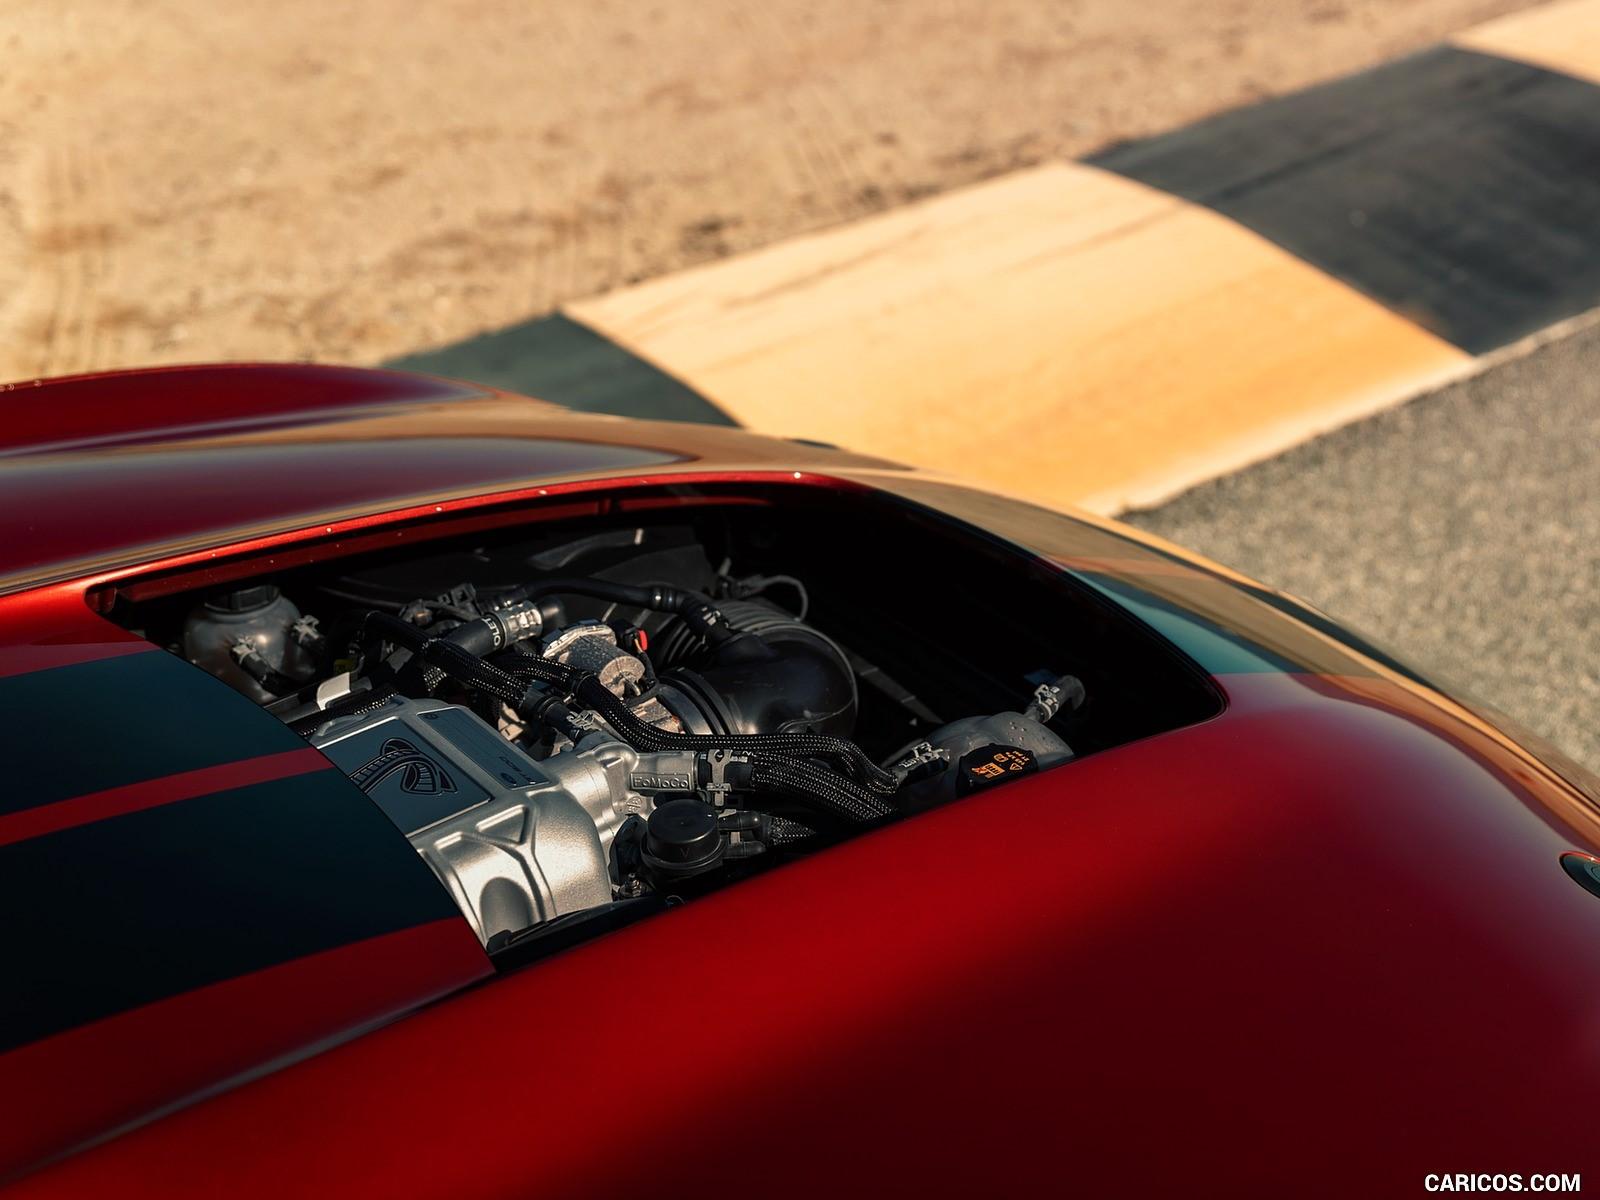 Ford Mustang Shelby 8k wallpaper